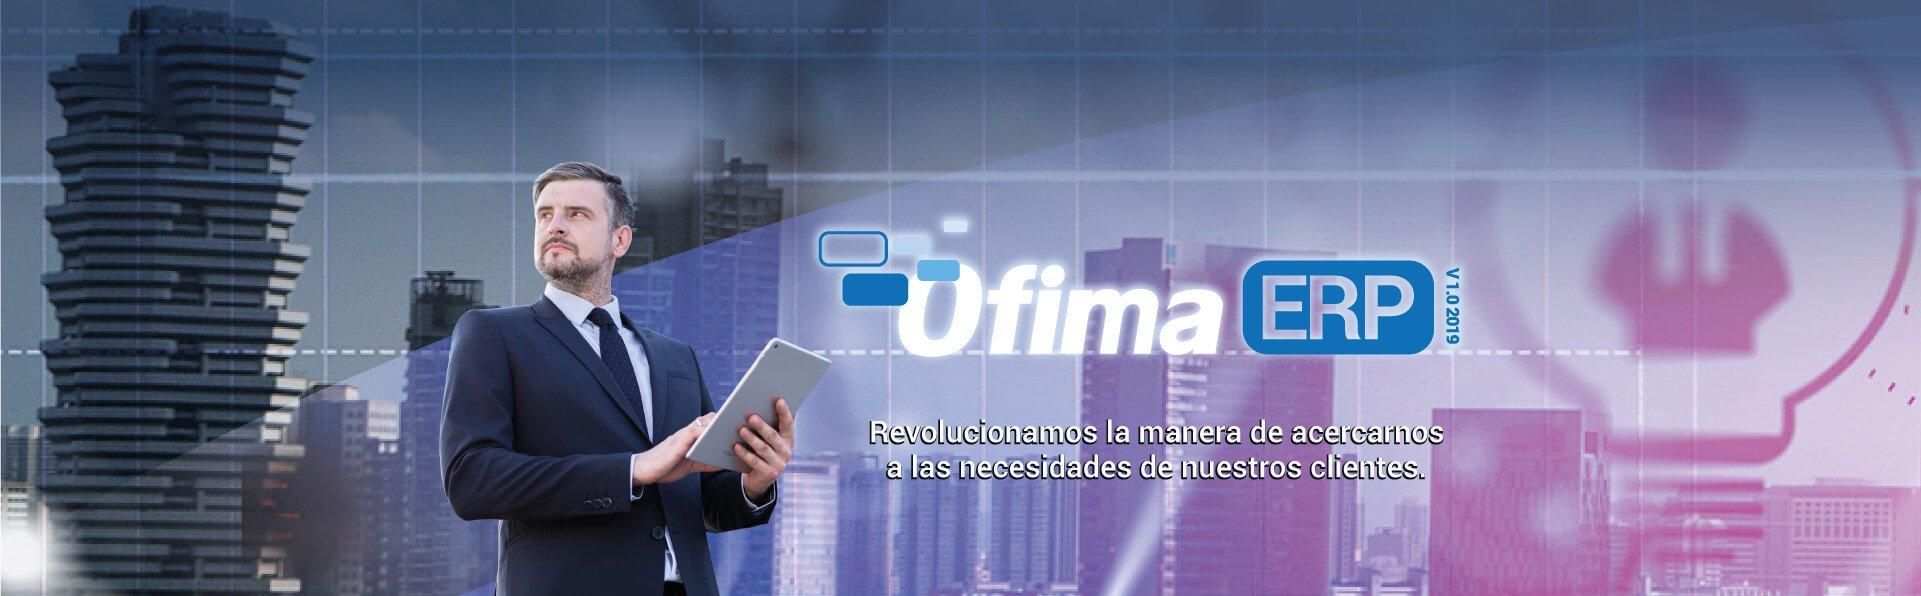 Ofima ERP 2019